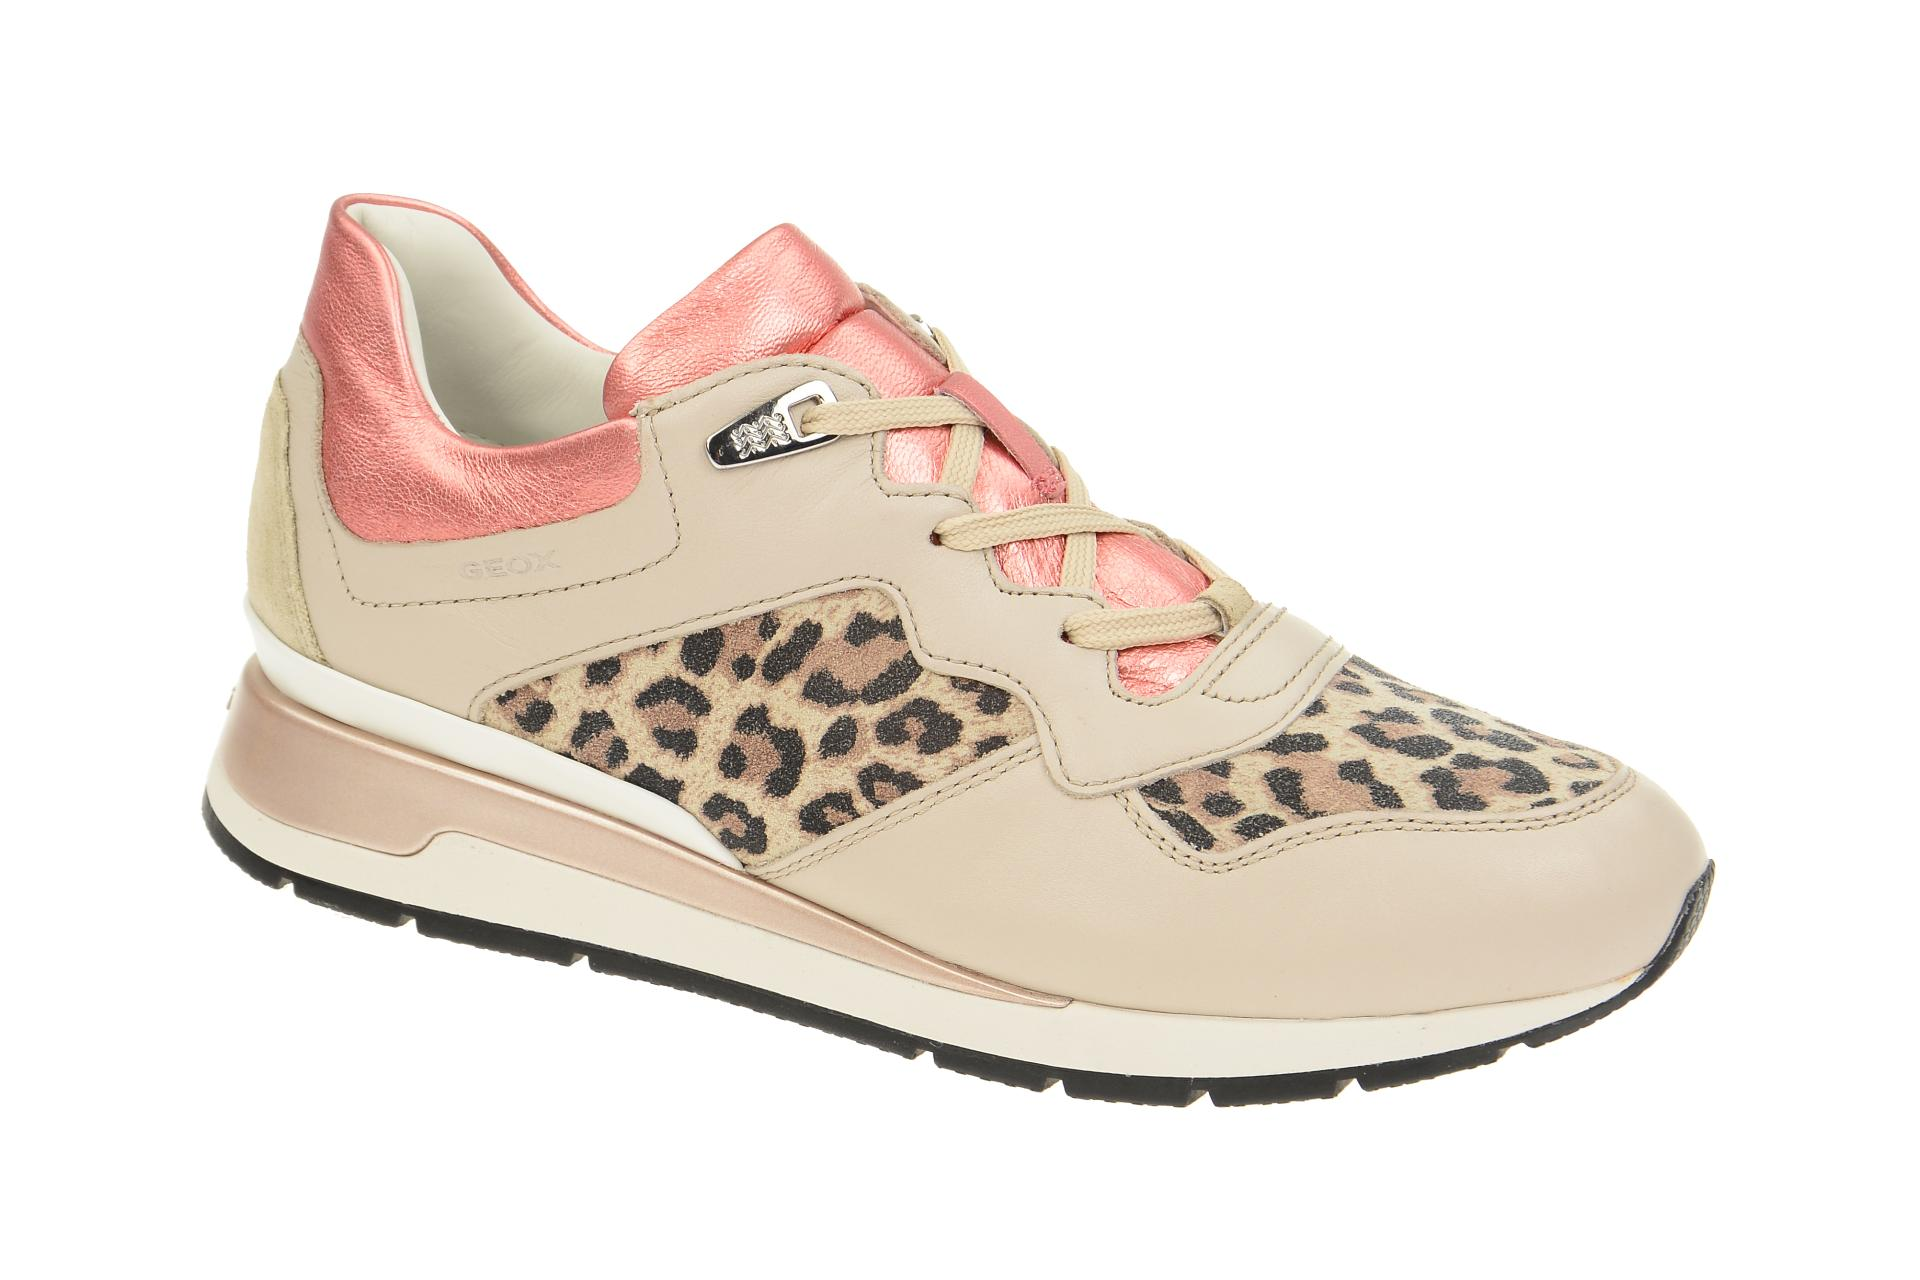 Shop Beige Strauch Schuhe Schuhhaus Leo Geox Mix Shahira HYID2WE9